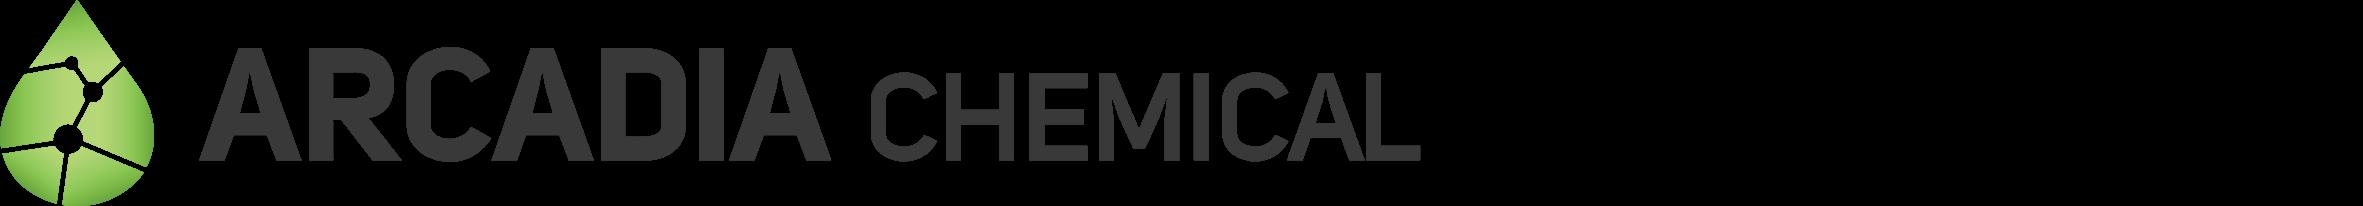 Arcadia Chemical & Preservative Logo